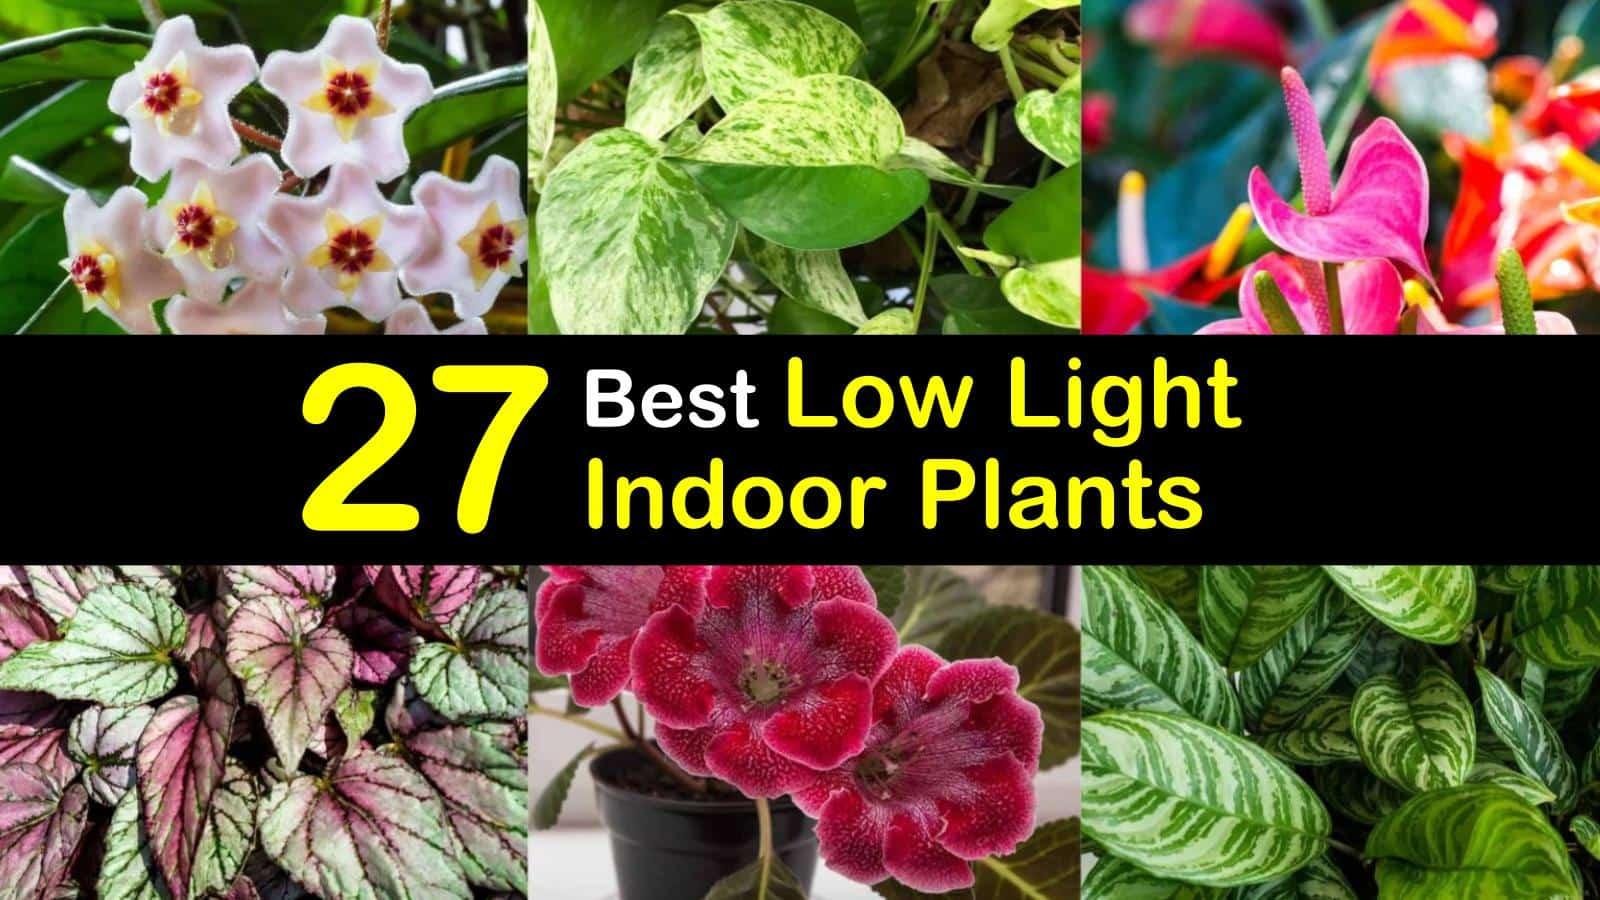 27 Best Low Light Indoor Plants For Light Starved Rooms